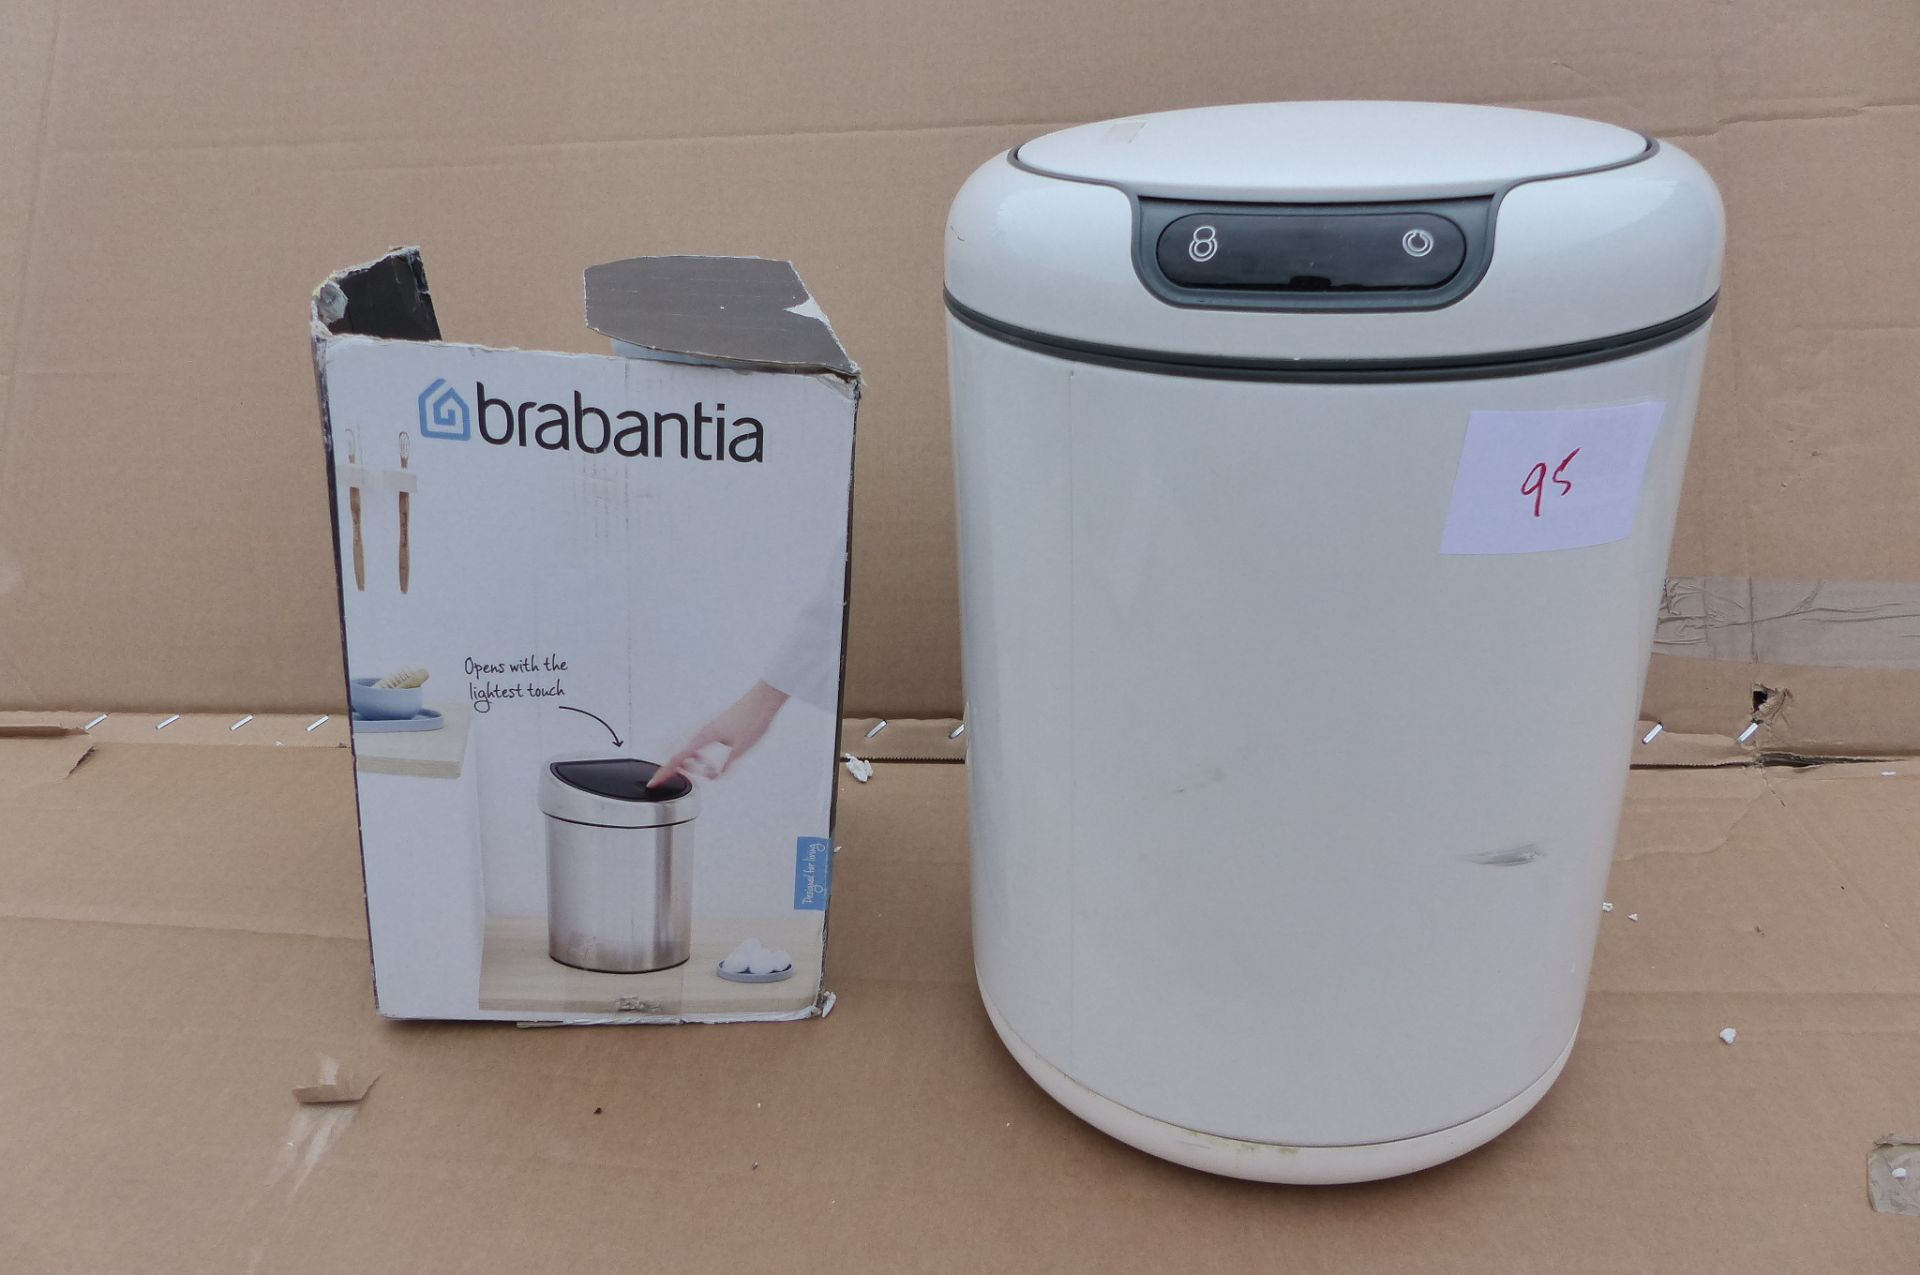 2 Waste bins EKO Sensor bin and Brabantia